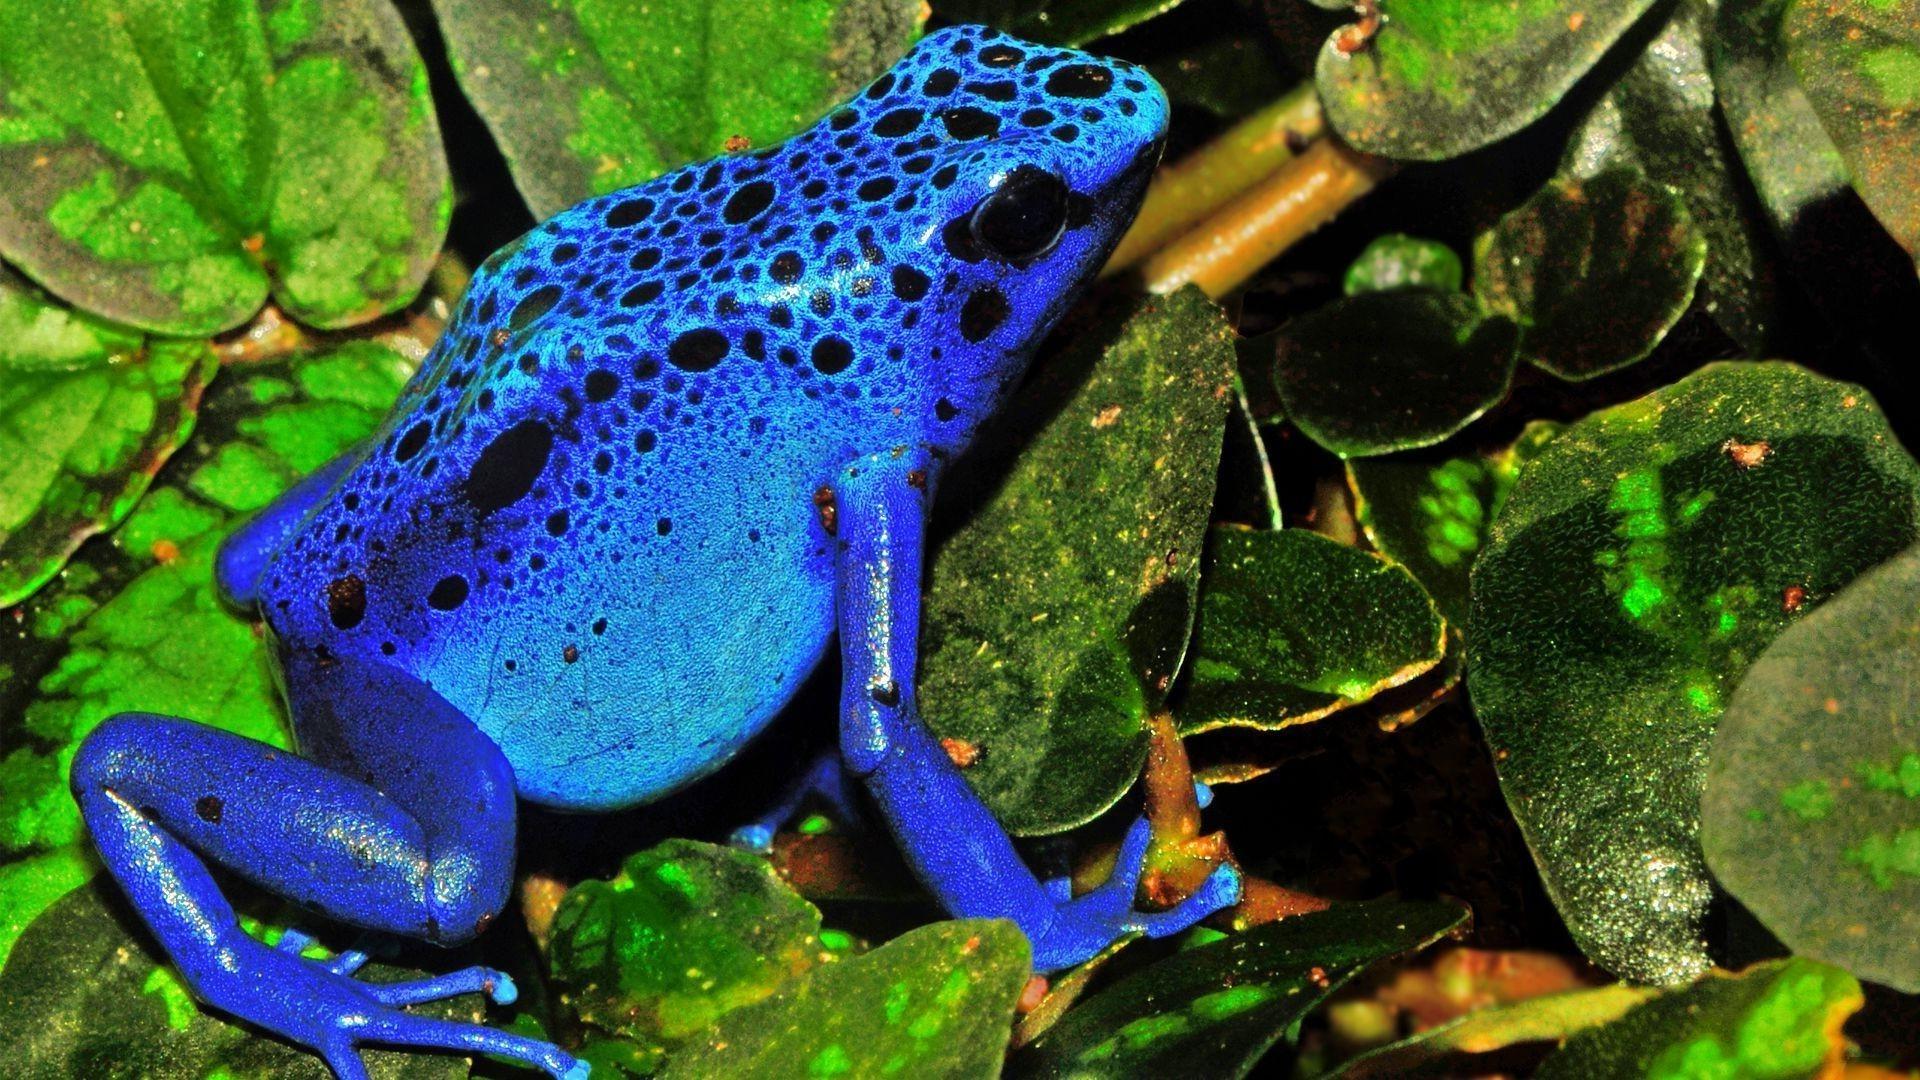 картинки голубых лягушек пашет, идиотство